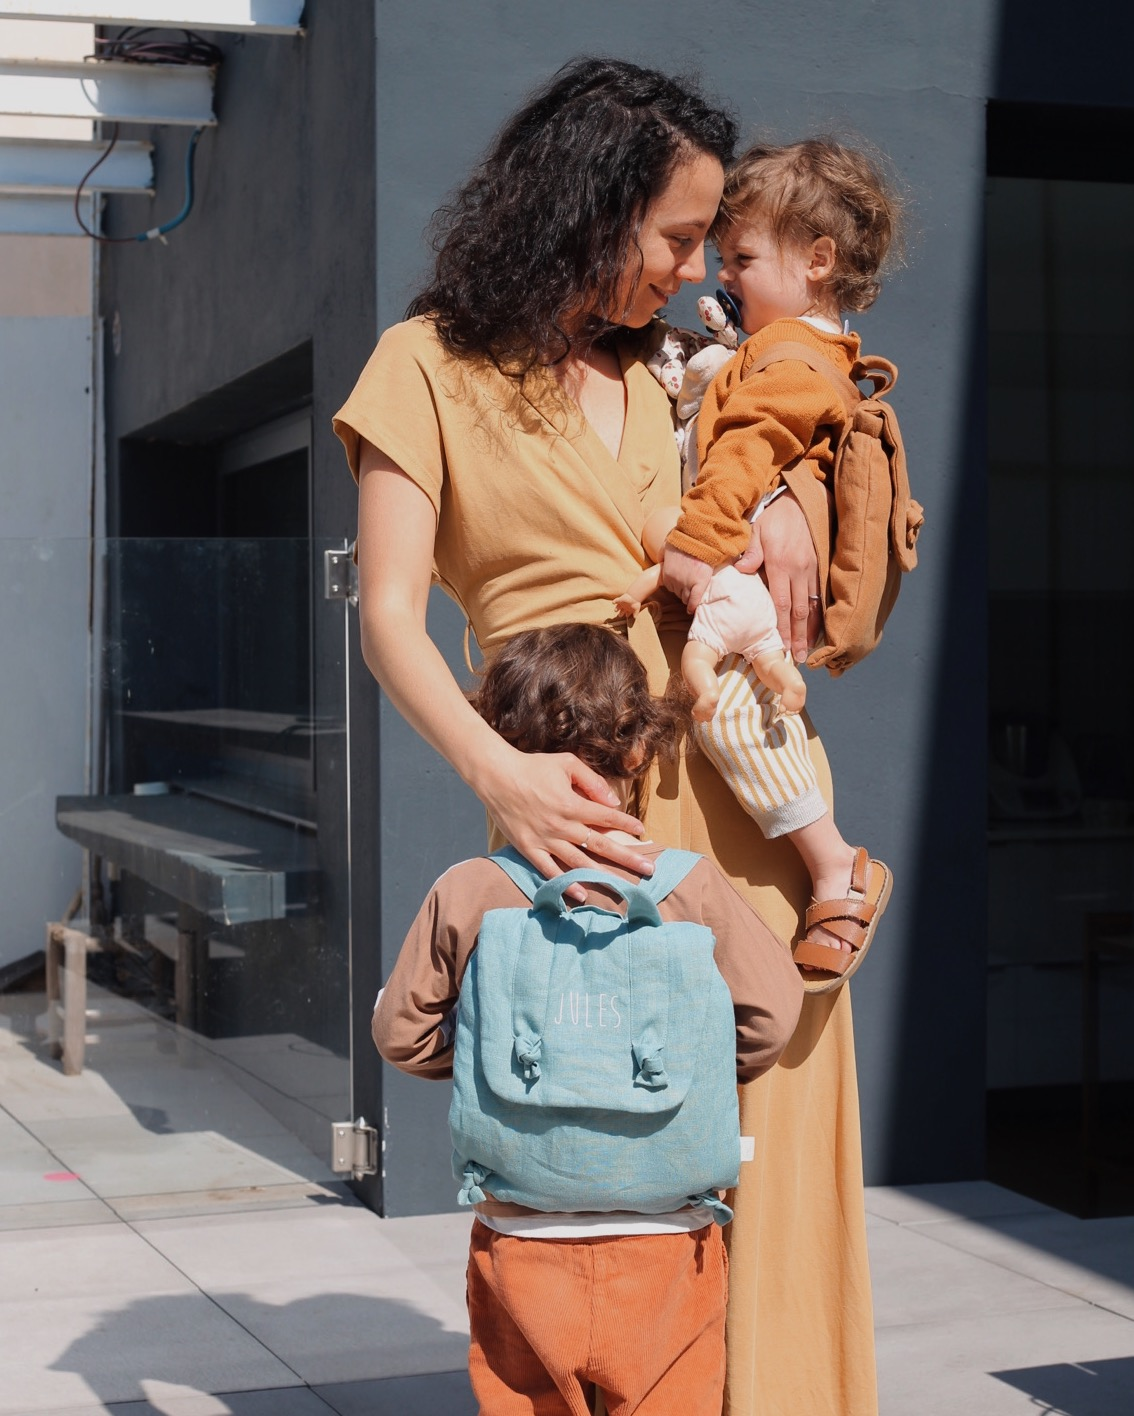 maman-imparfaite-yasmine-boheas-bonjourlasmala-blogzine-sundaygrenadine-6.jpg